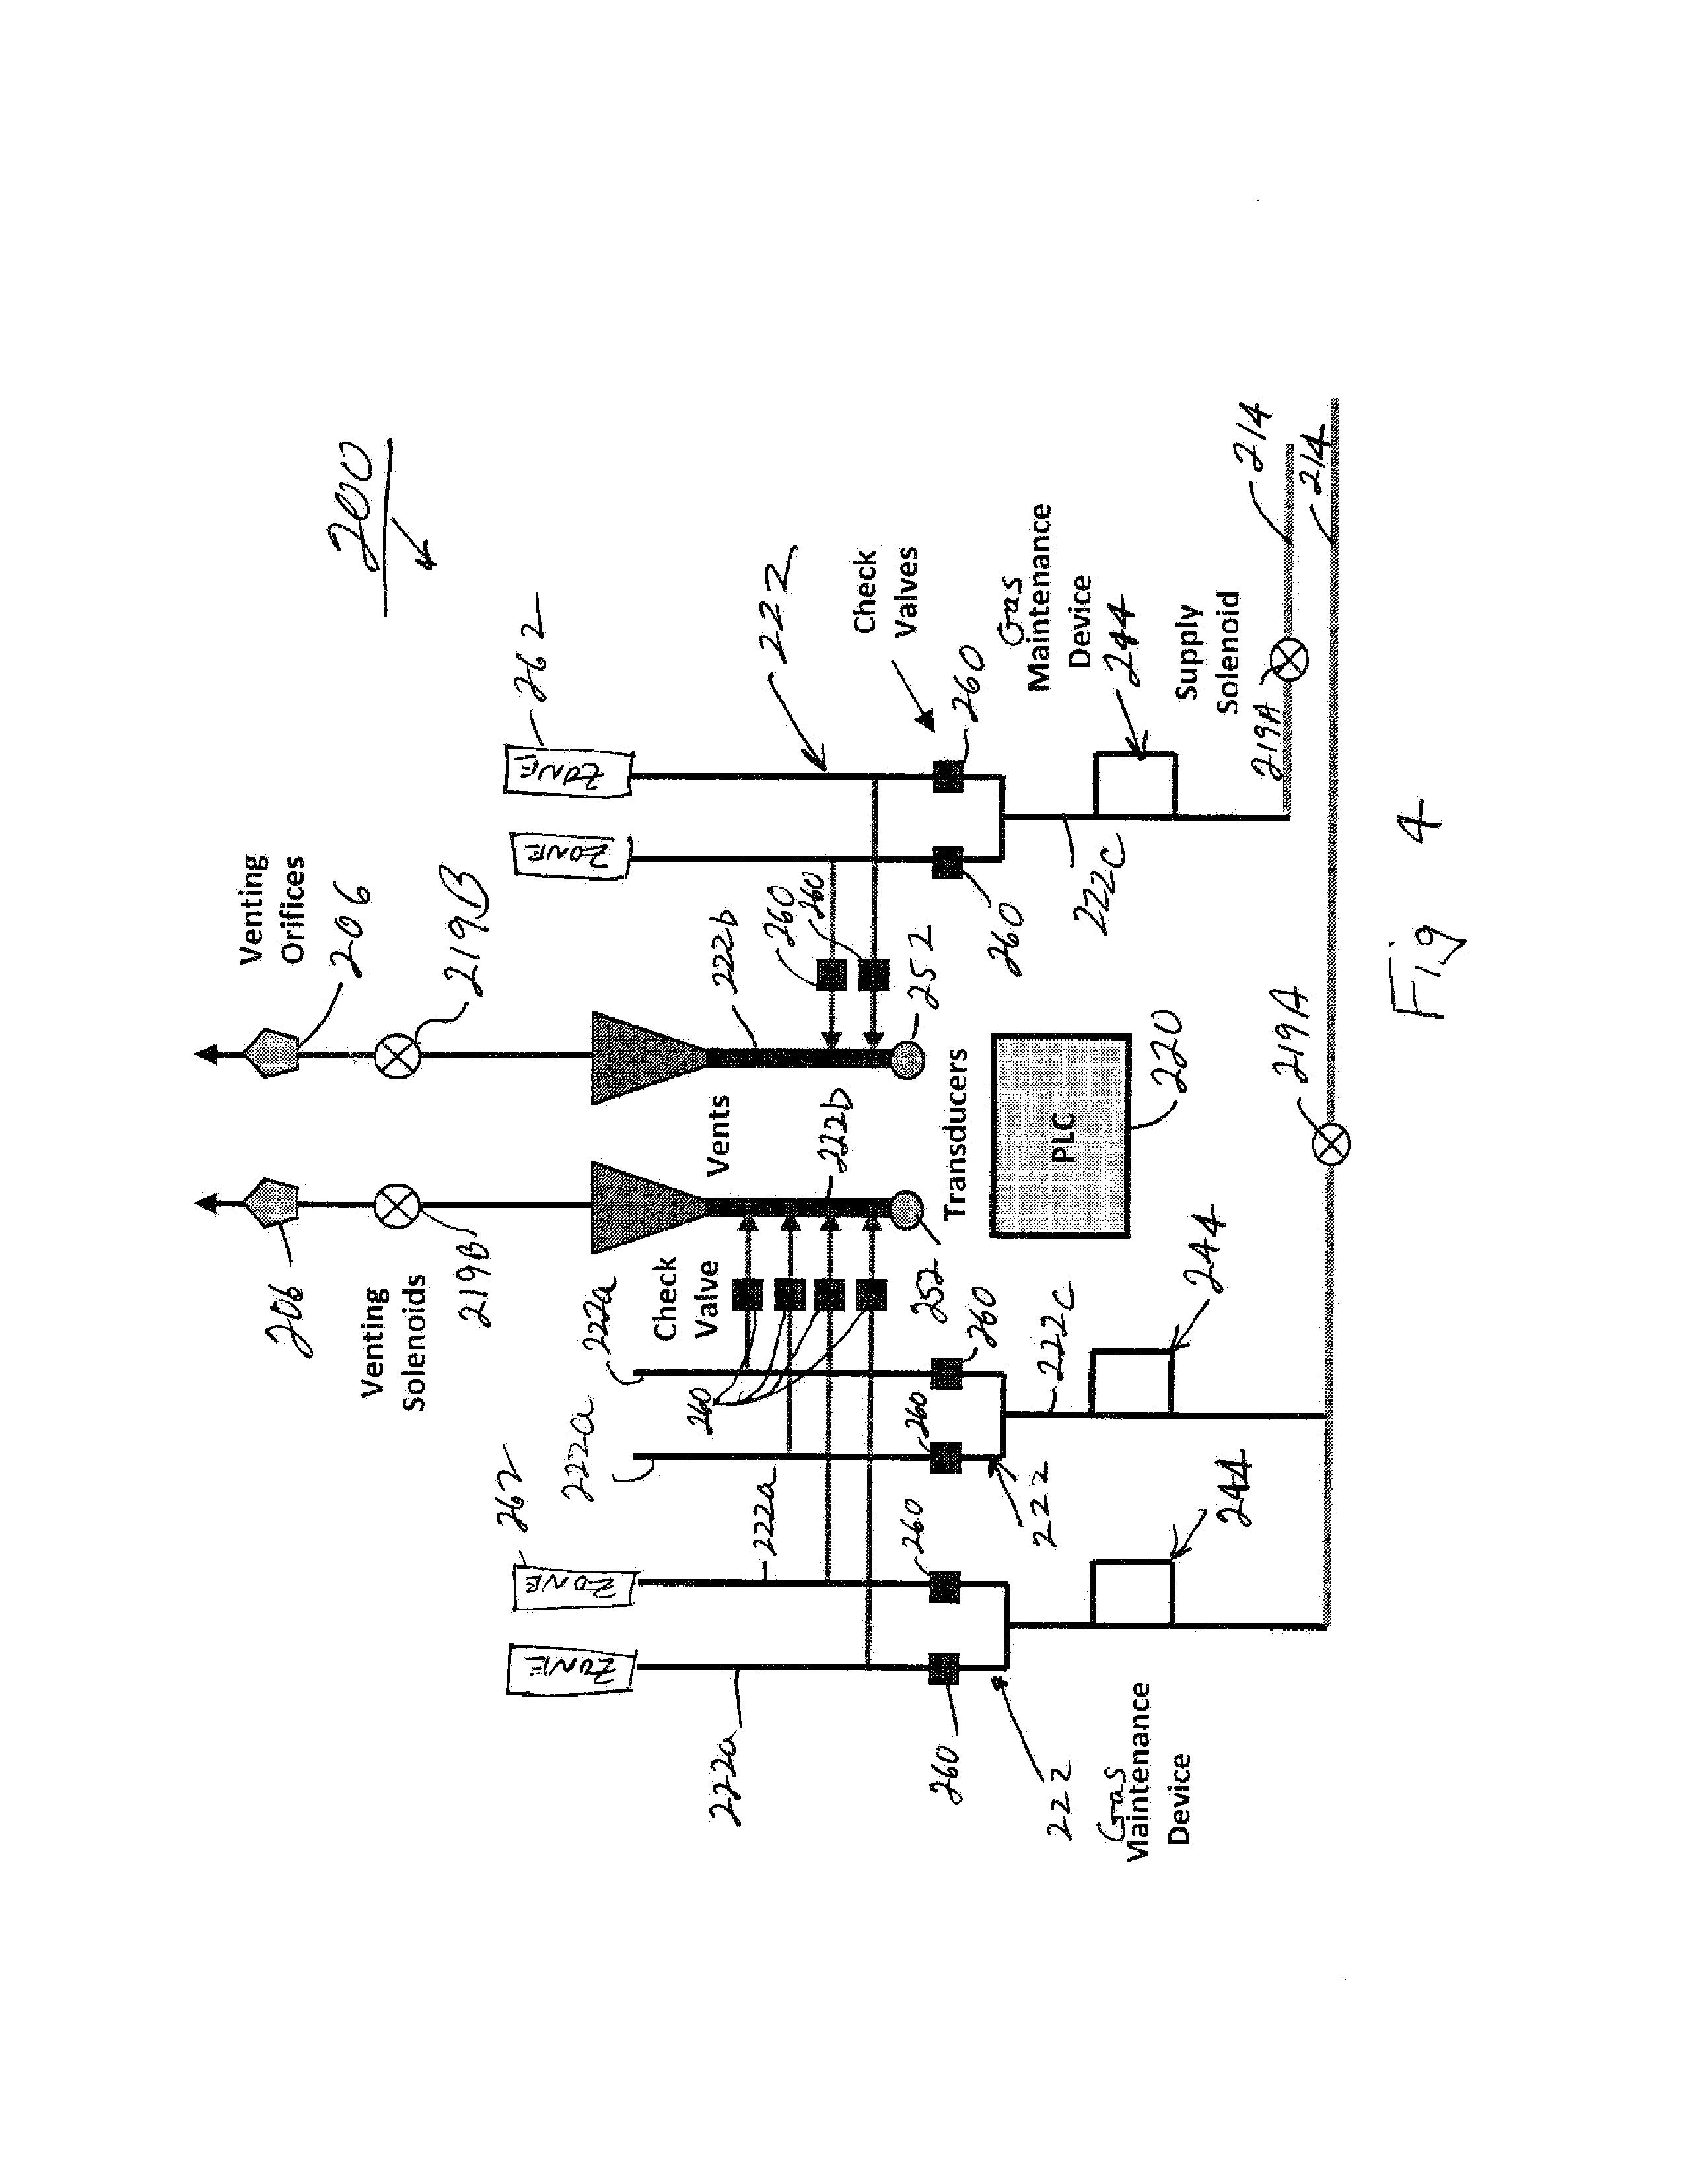 rain bird solenoid wiring diagram